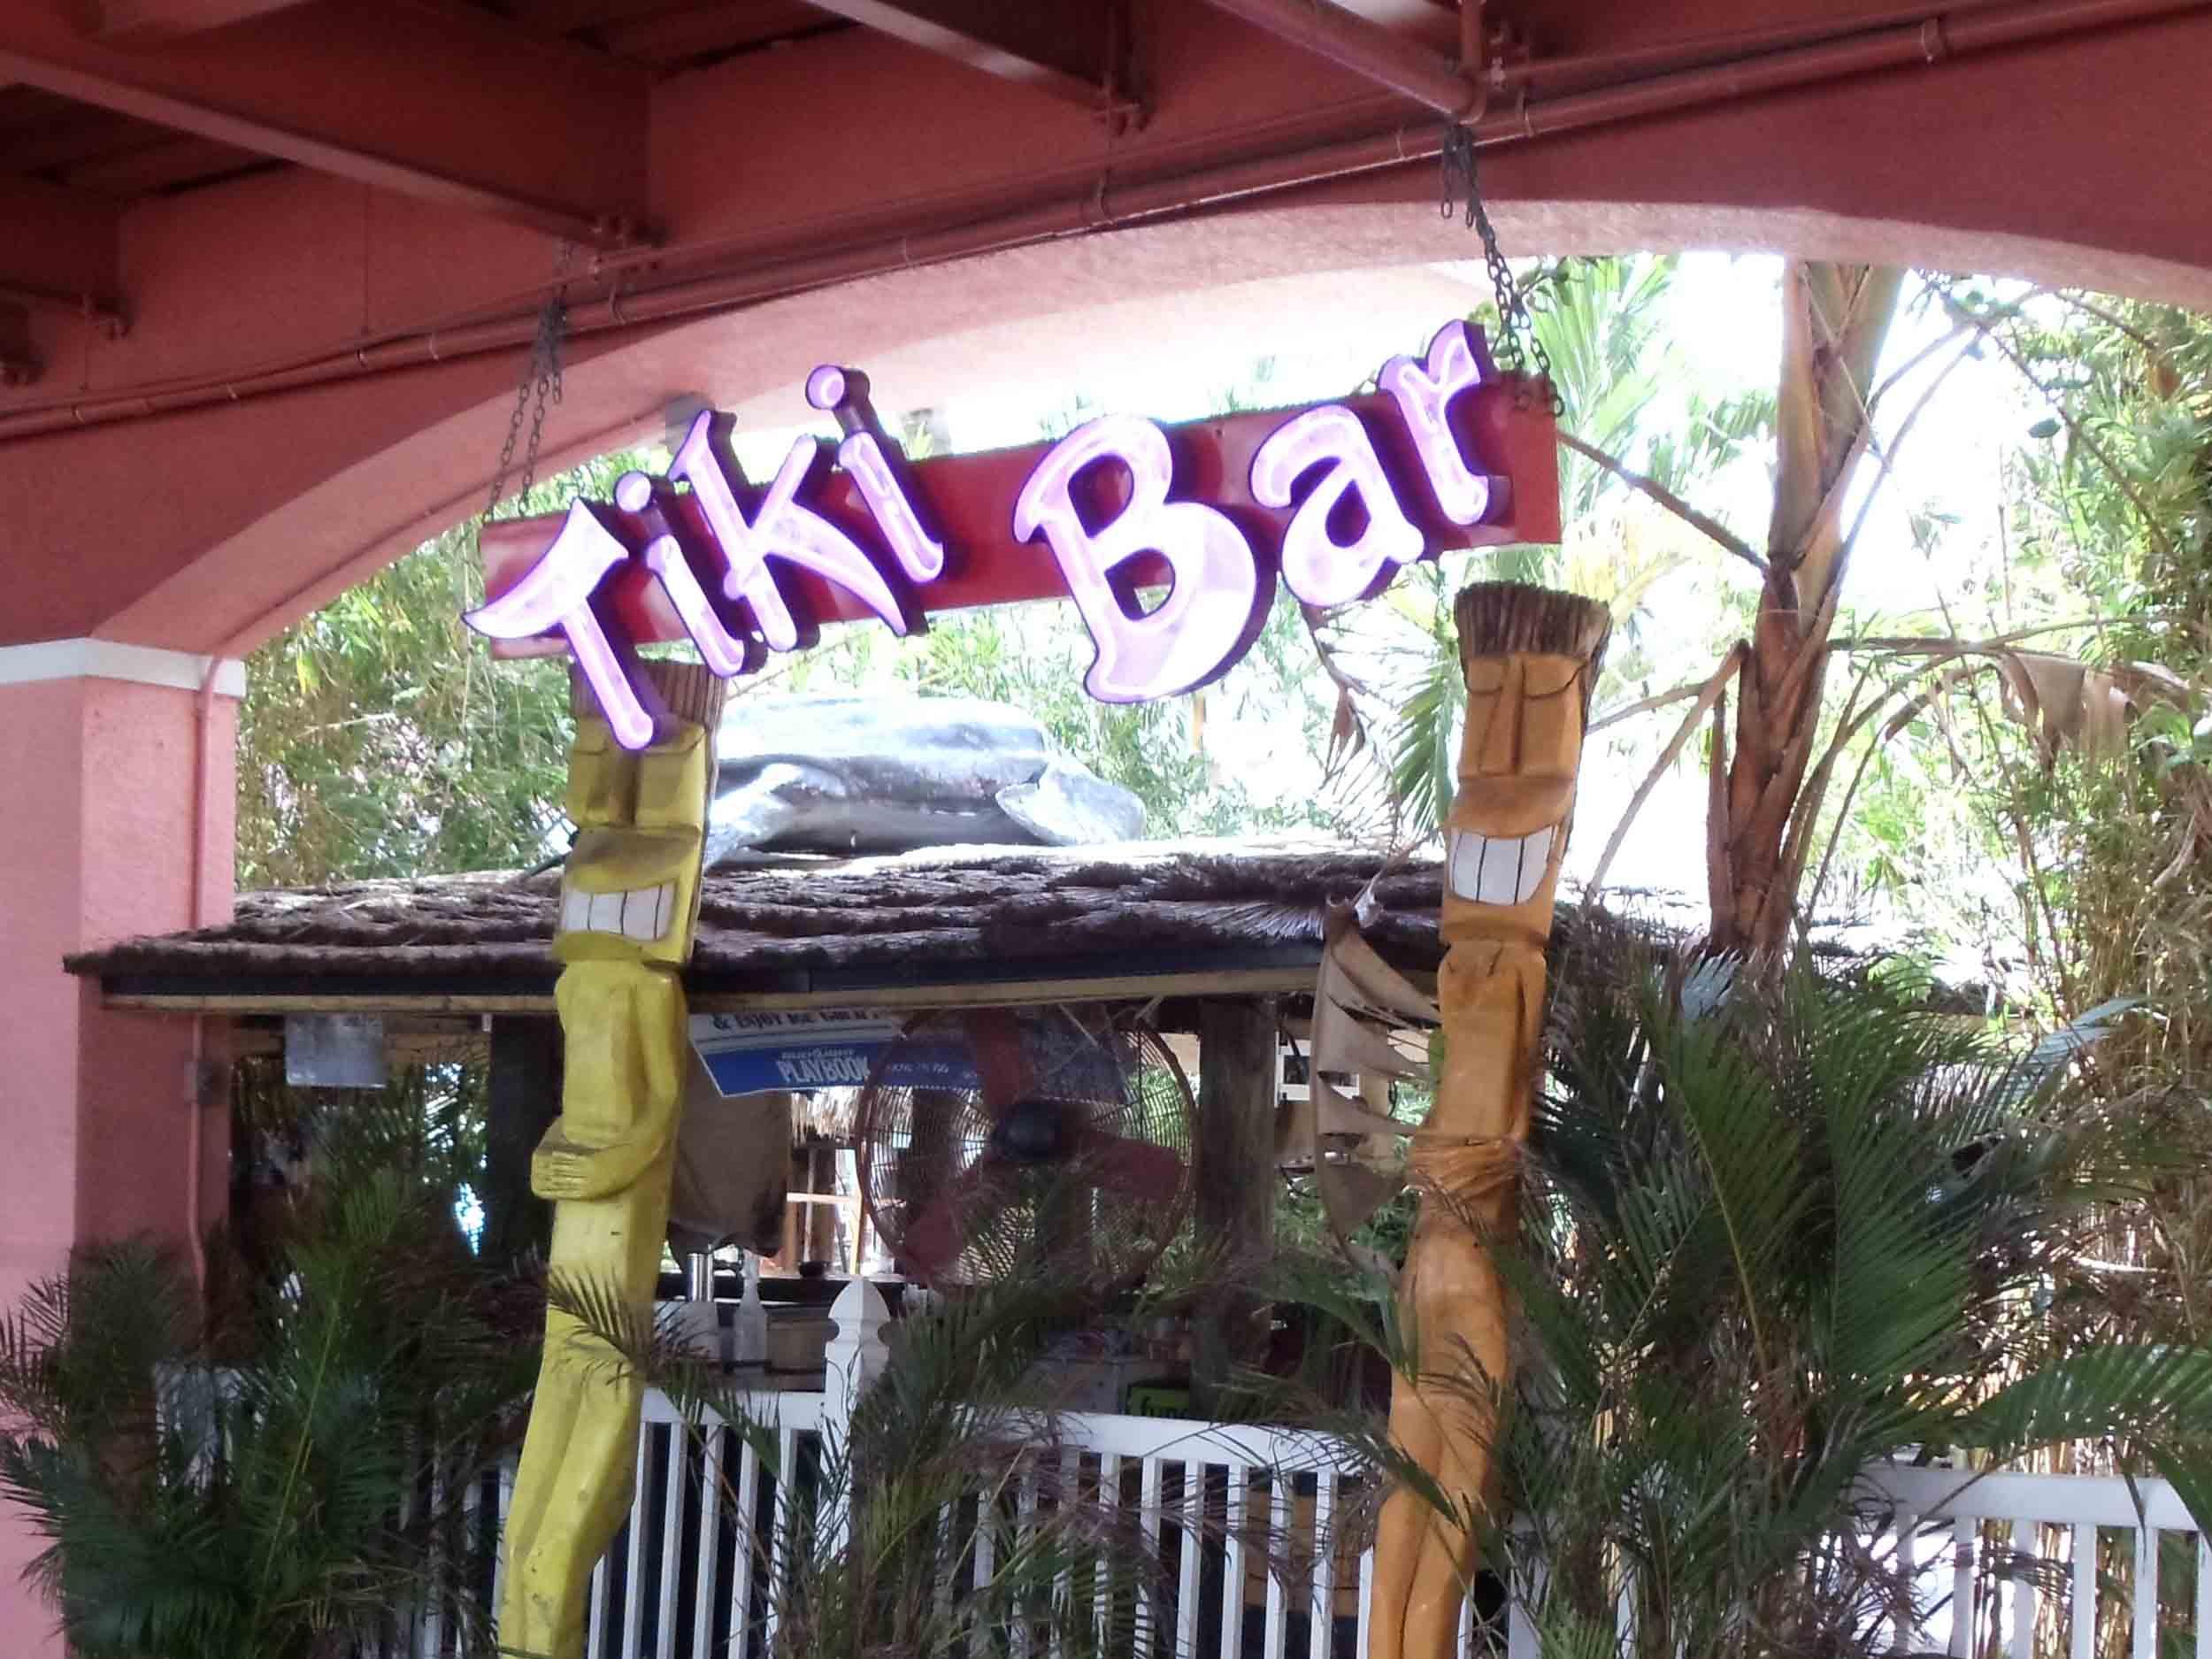 Lighthouse Resort Tiki Bar and Grill Entrance